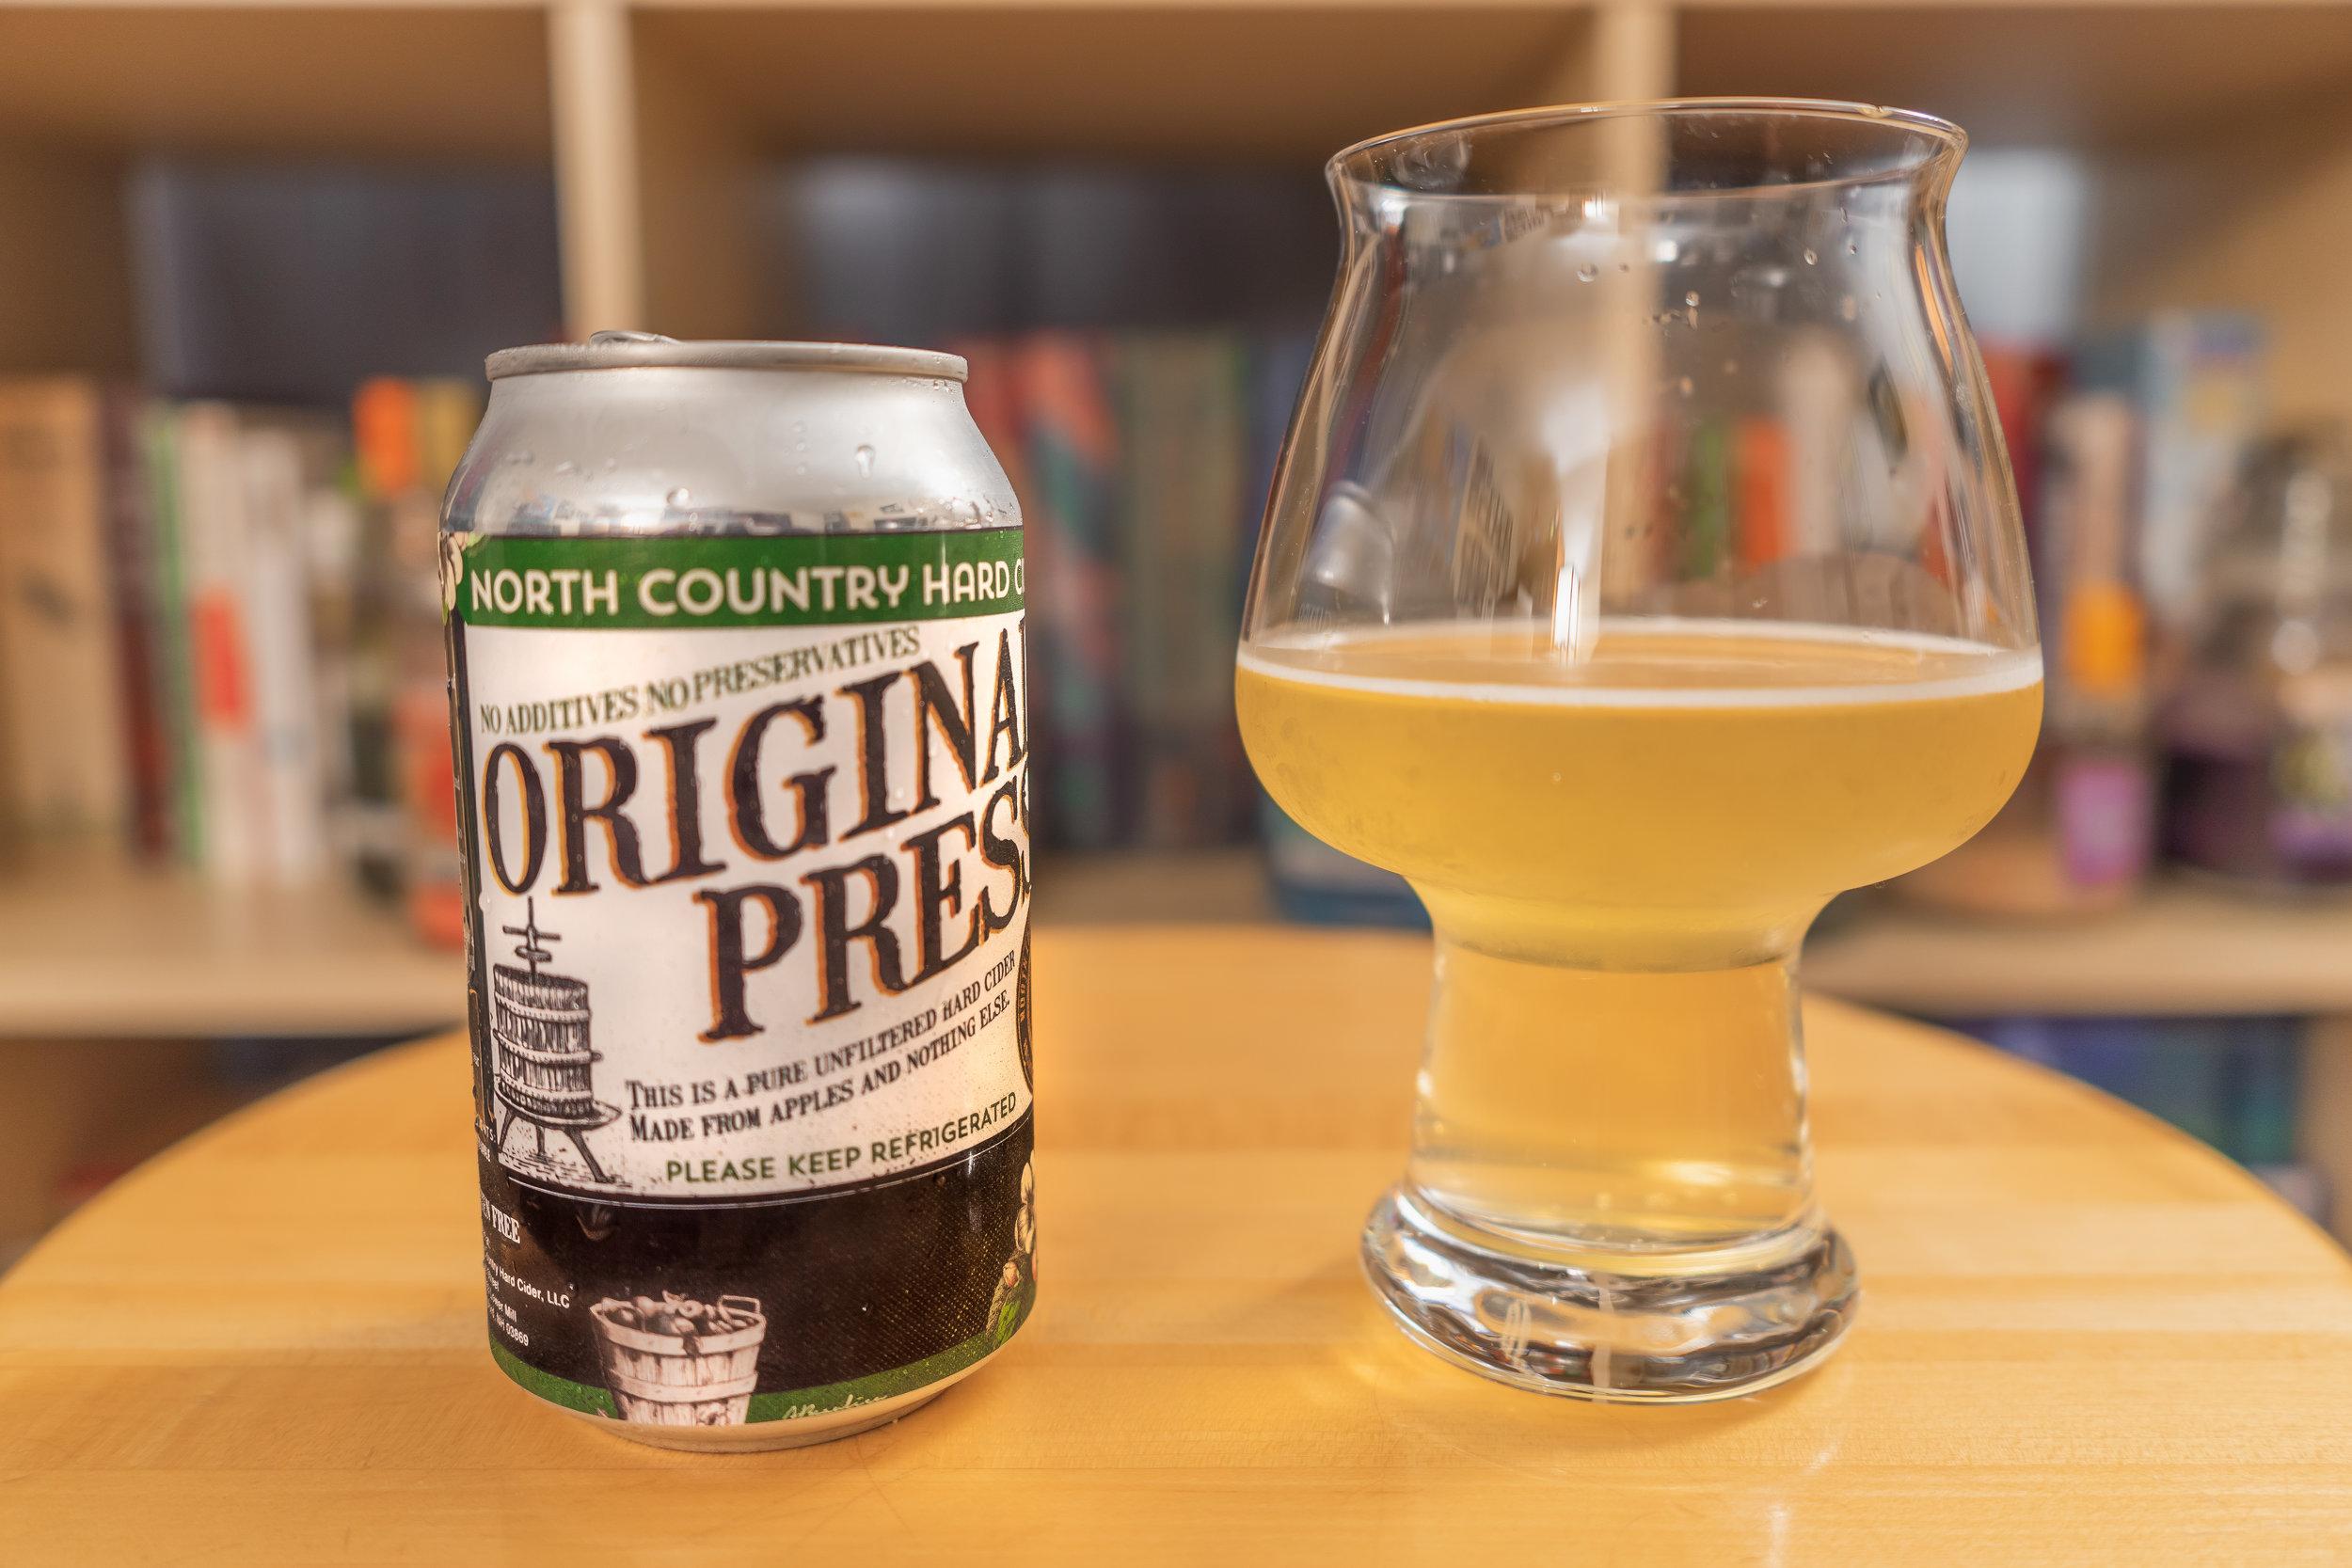 North Country Hard Cider: Original Press